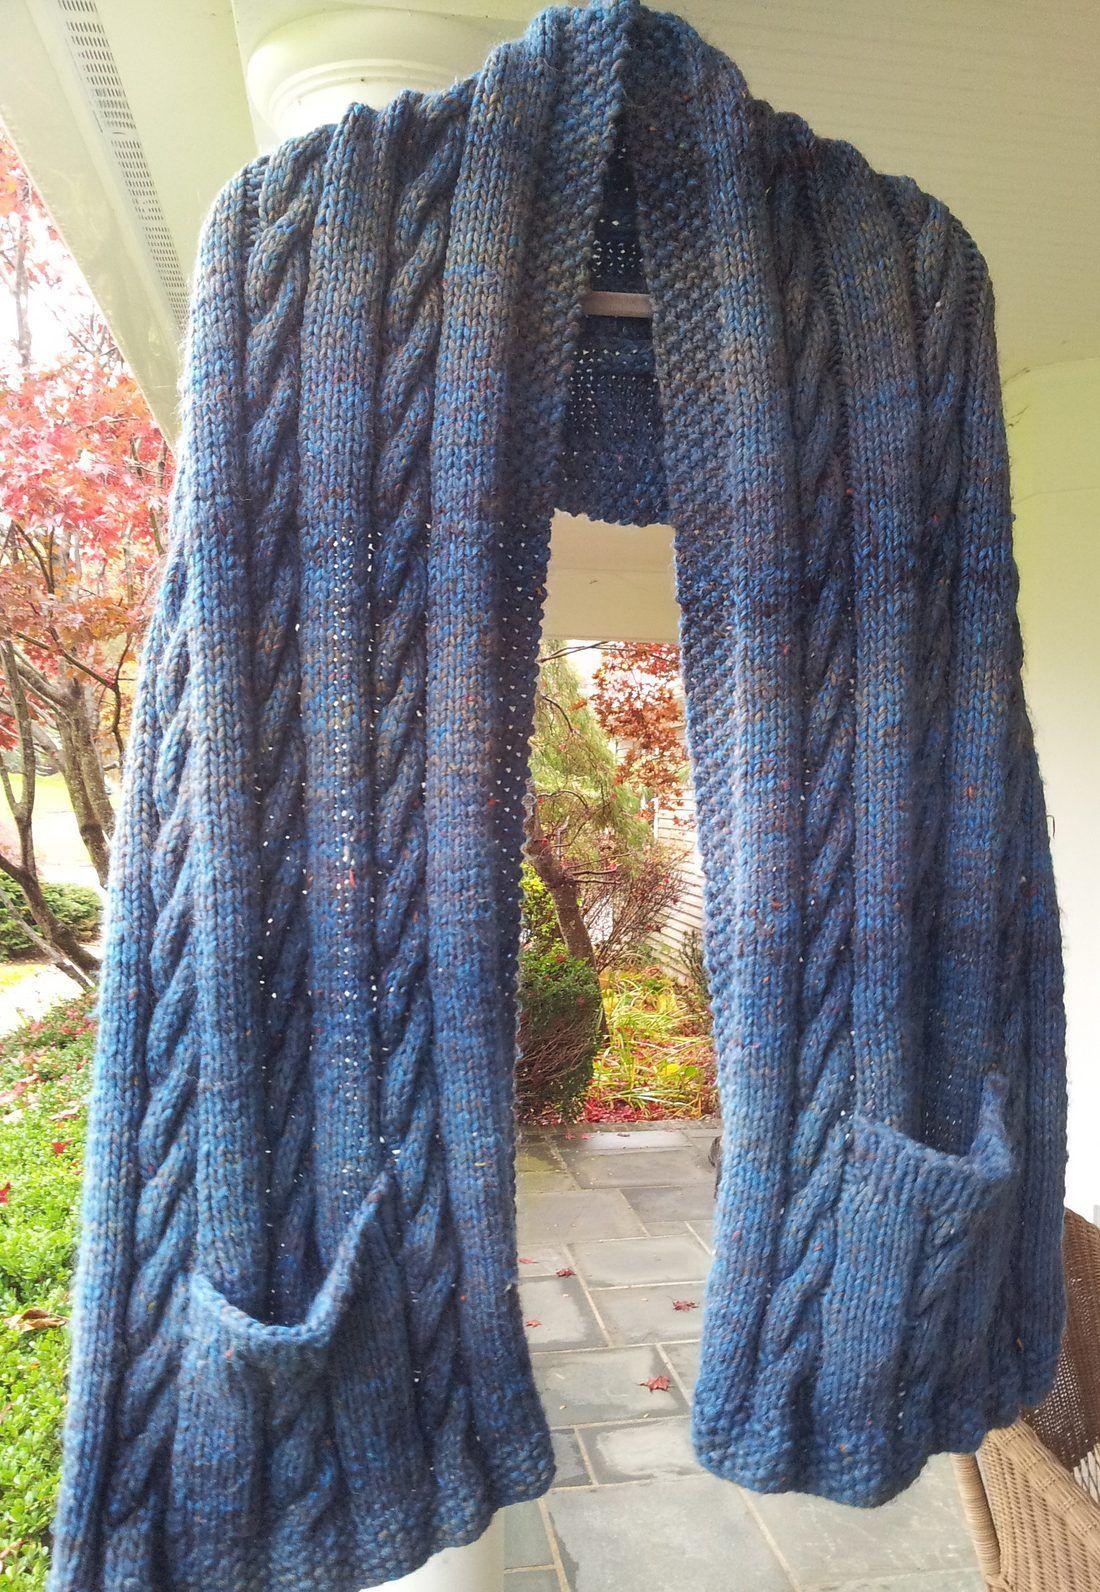 Super bulky yarn knitting patterns super bulky yarn knitting super bulky yarn knitting patterns bankloansurffo Gallery